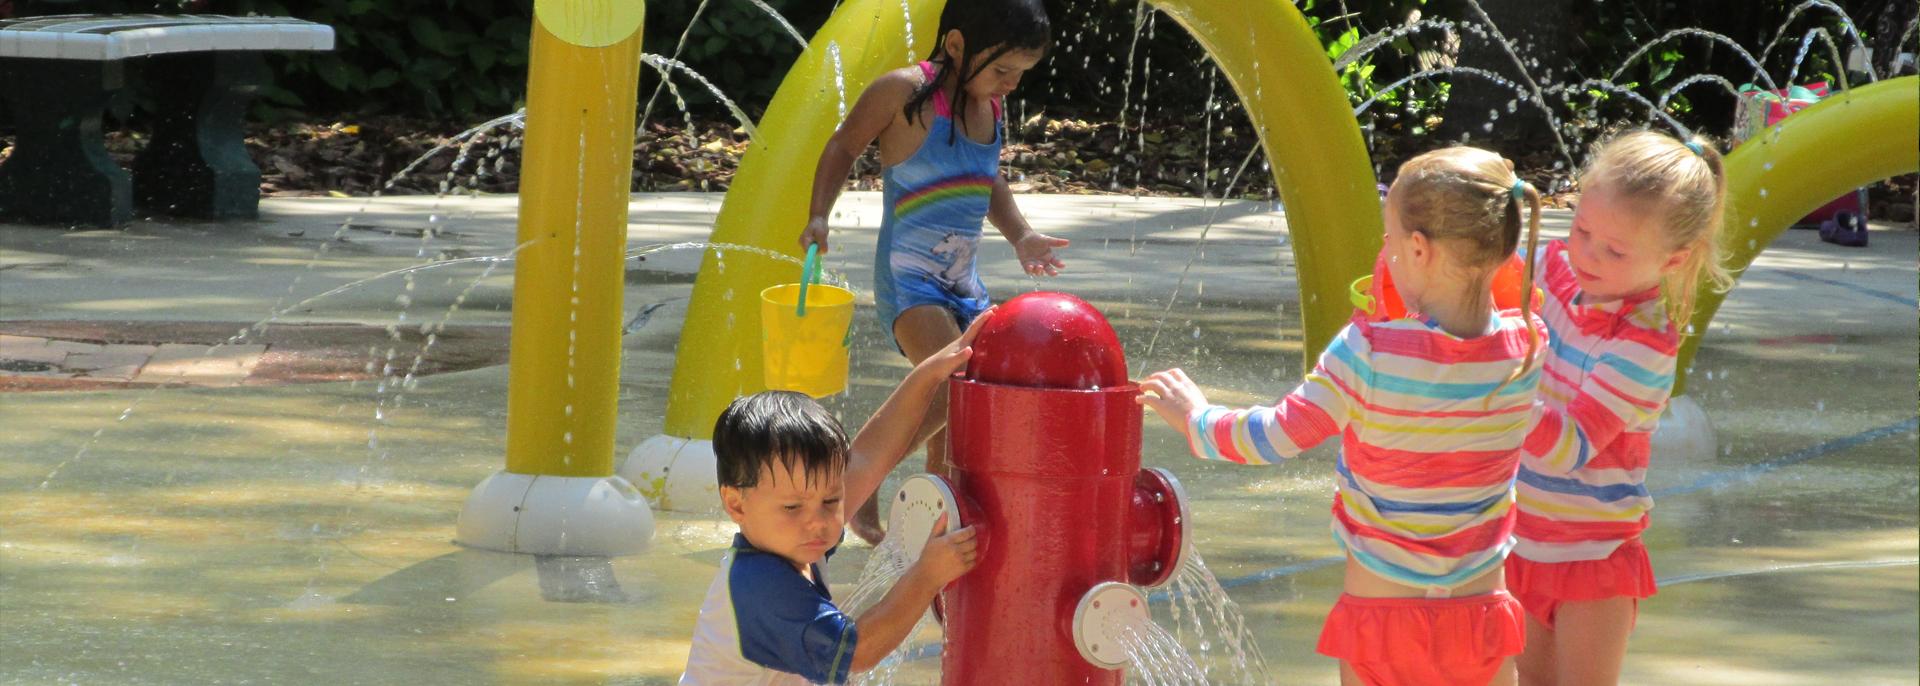 Splash 'N Play